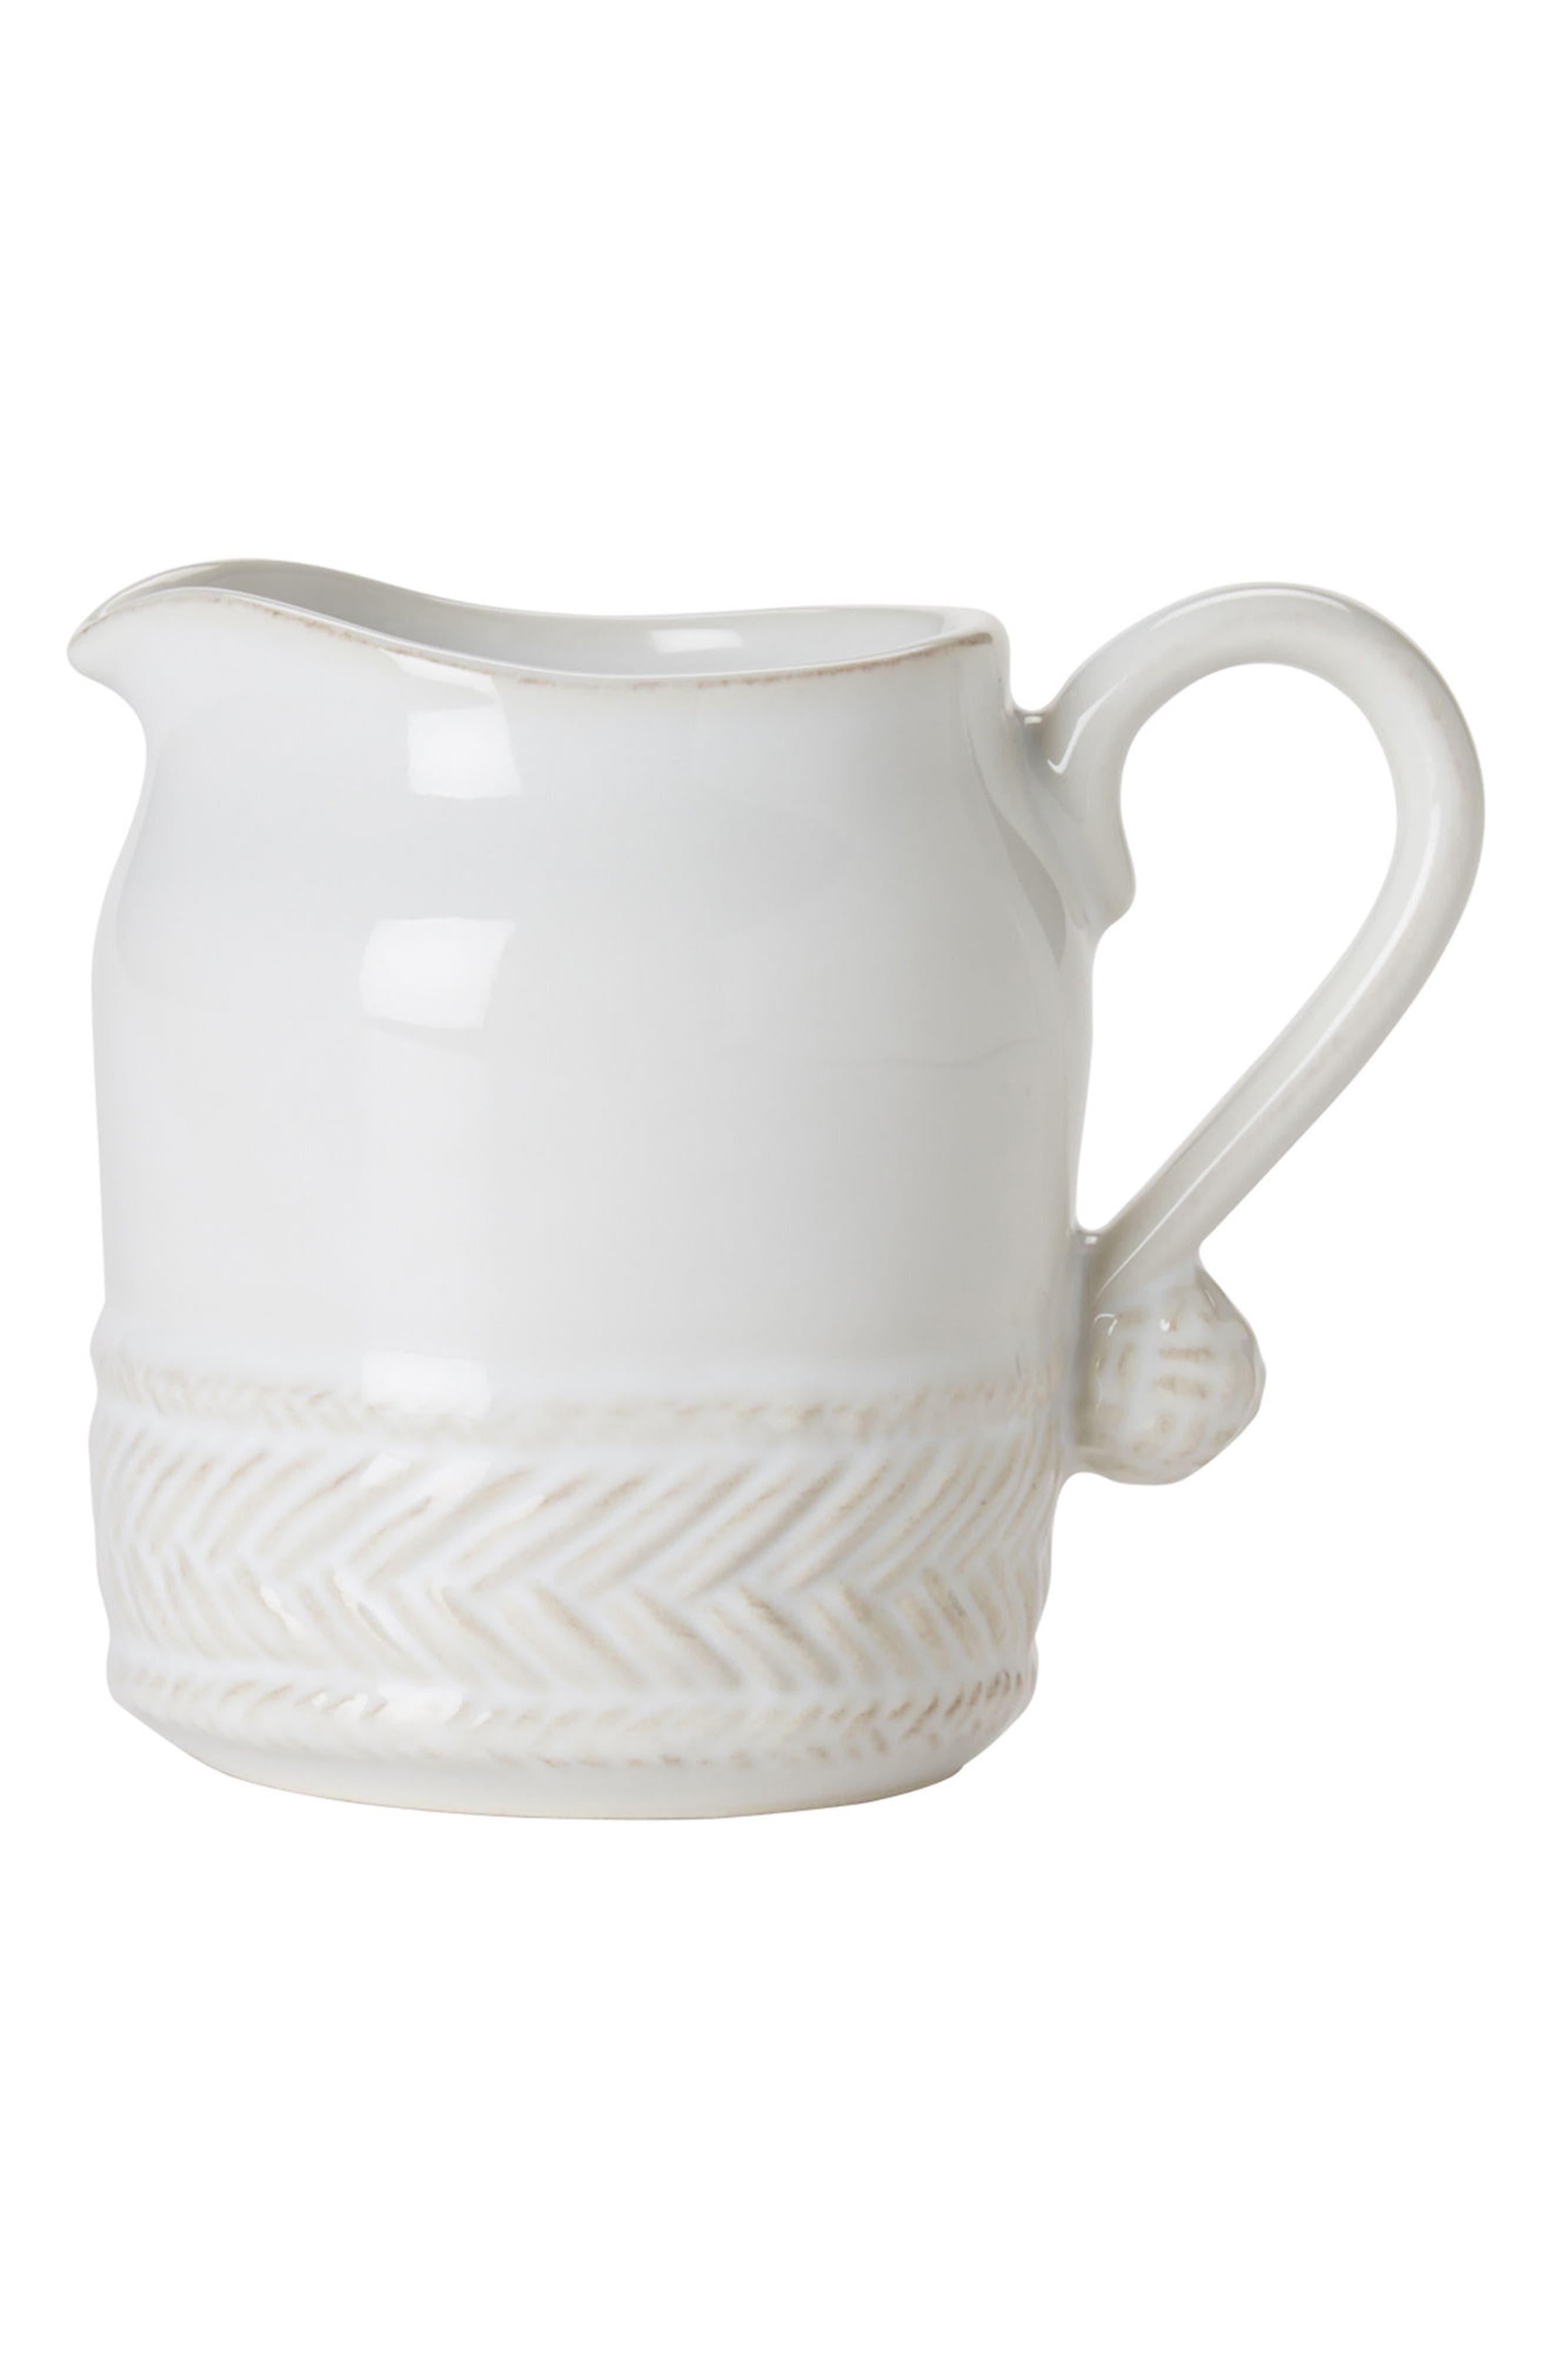 Le Panier Ceramic Creamer,                             Main thumbnail 1, color,                             Whitewash